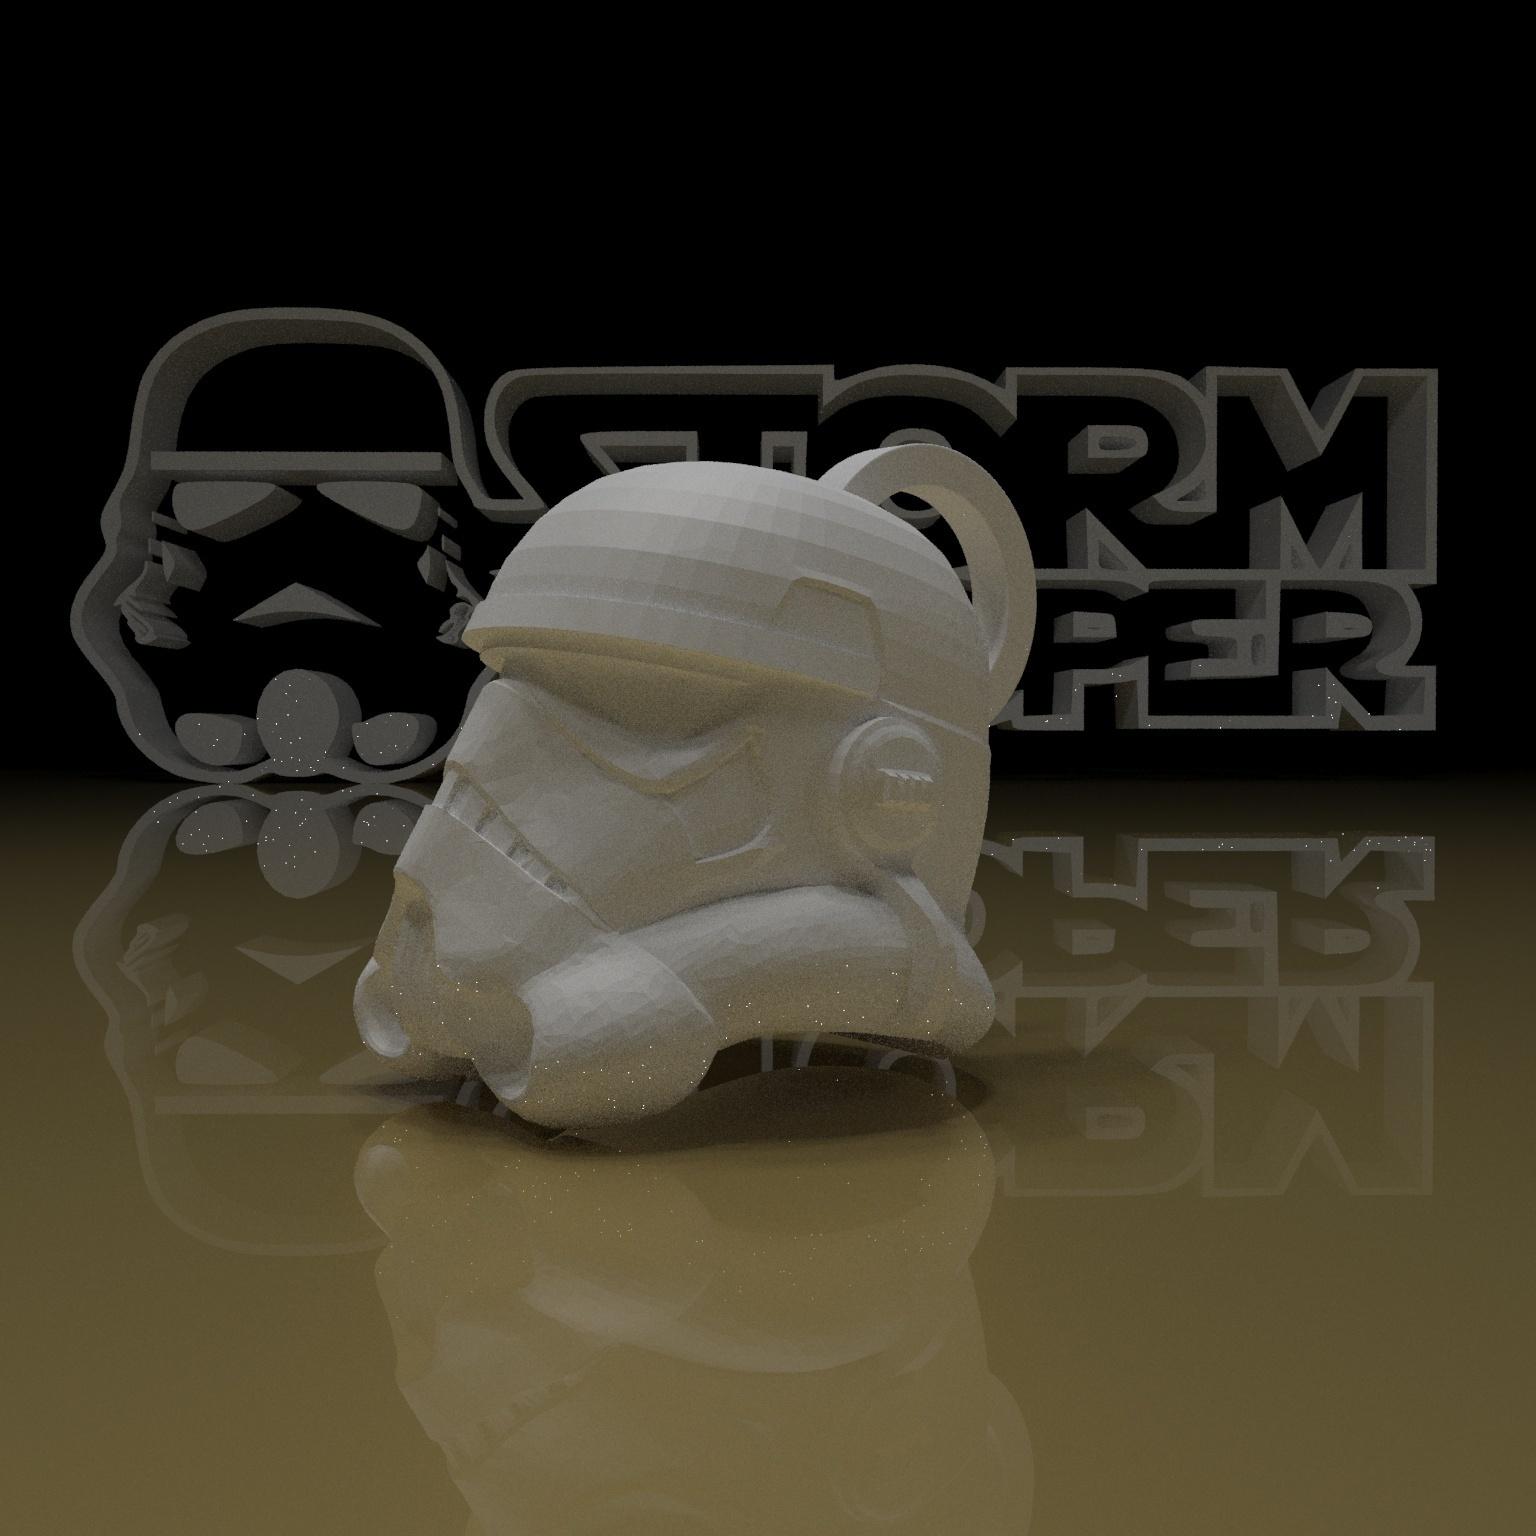 9.jpg Download free STL file STORMTROOPER KEY CHAIN • 3D printing template, paltony22